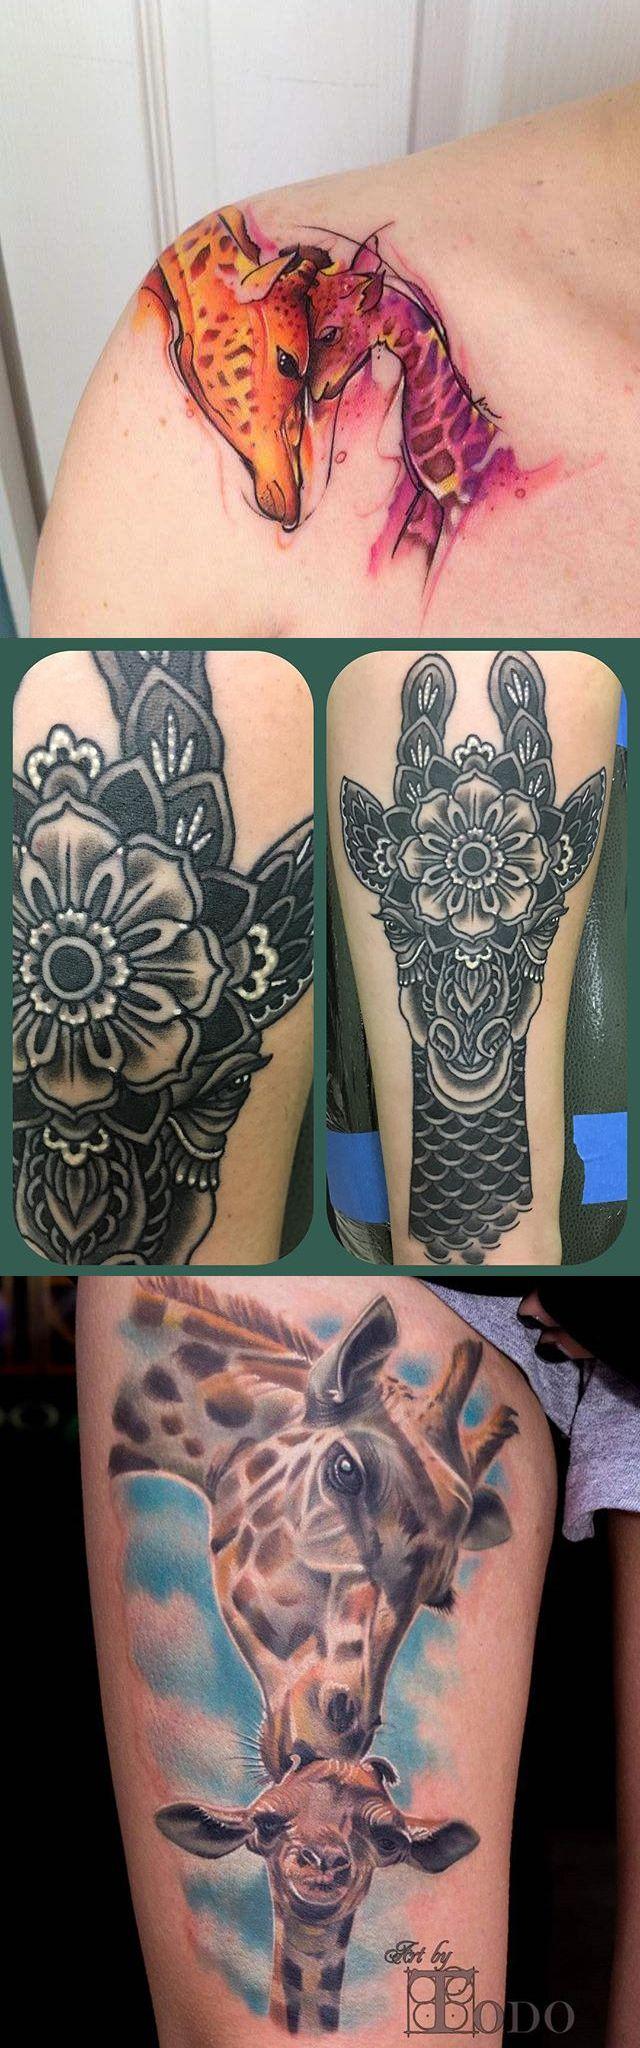 best 25 giraffe tattoos ideas on pinterest small